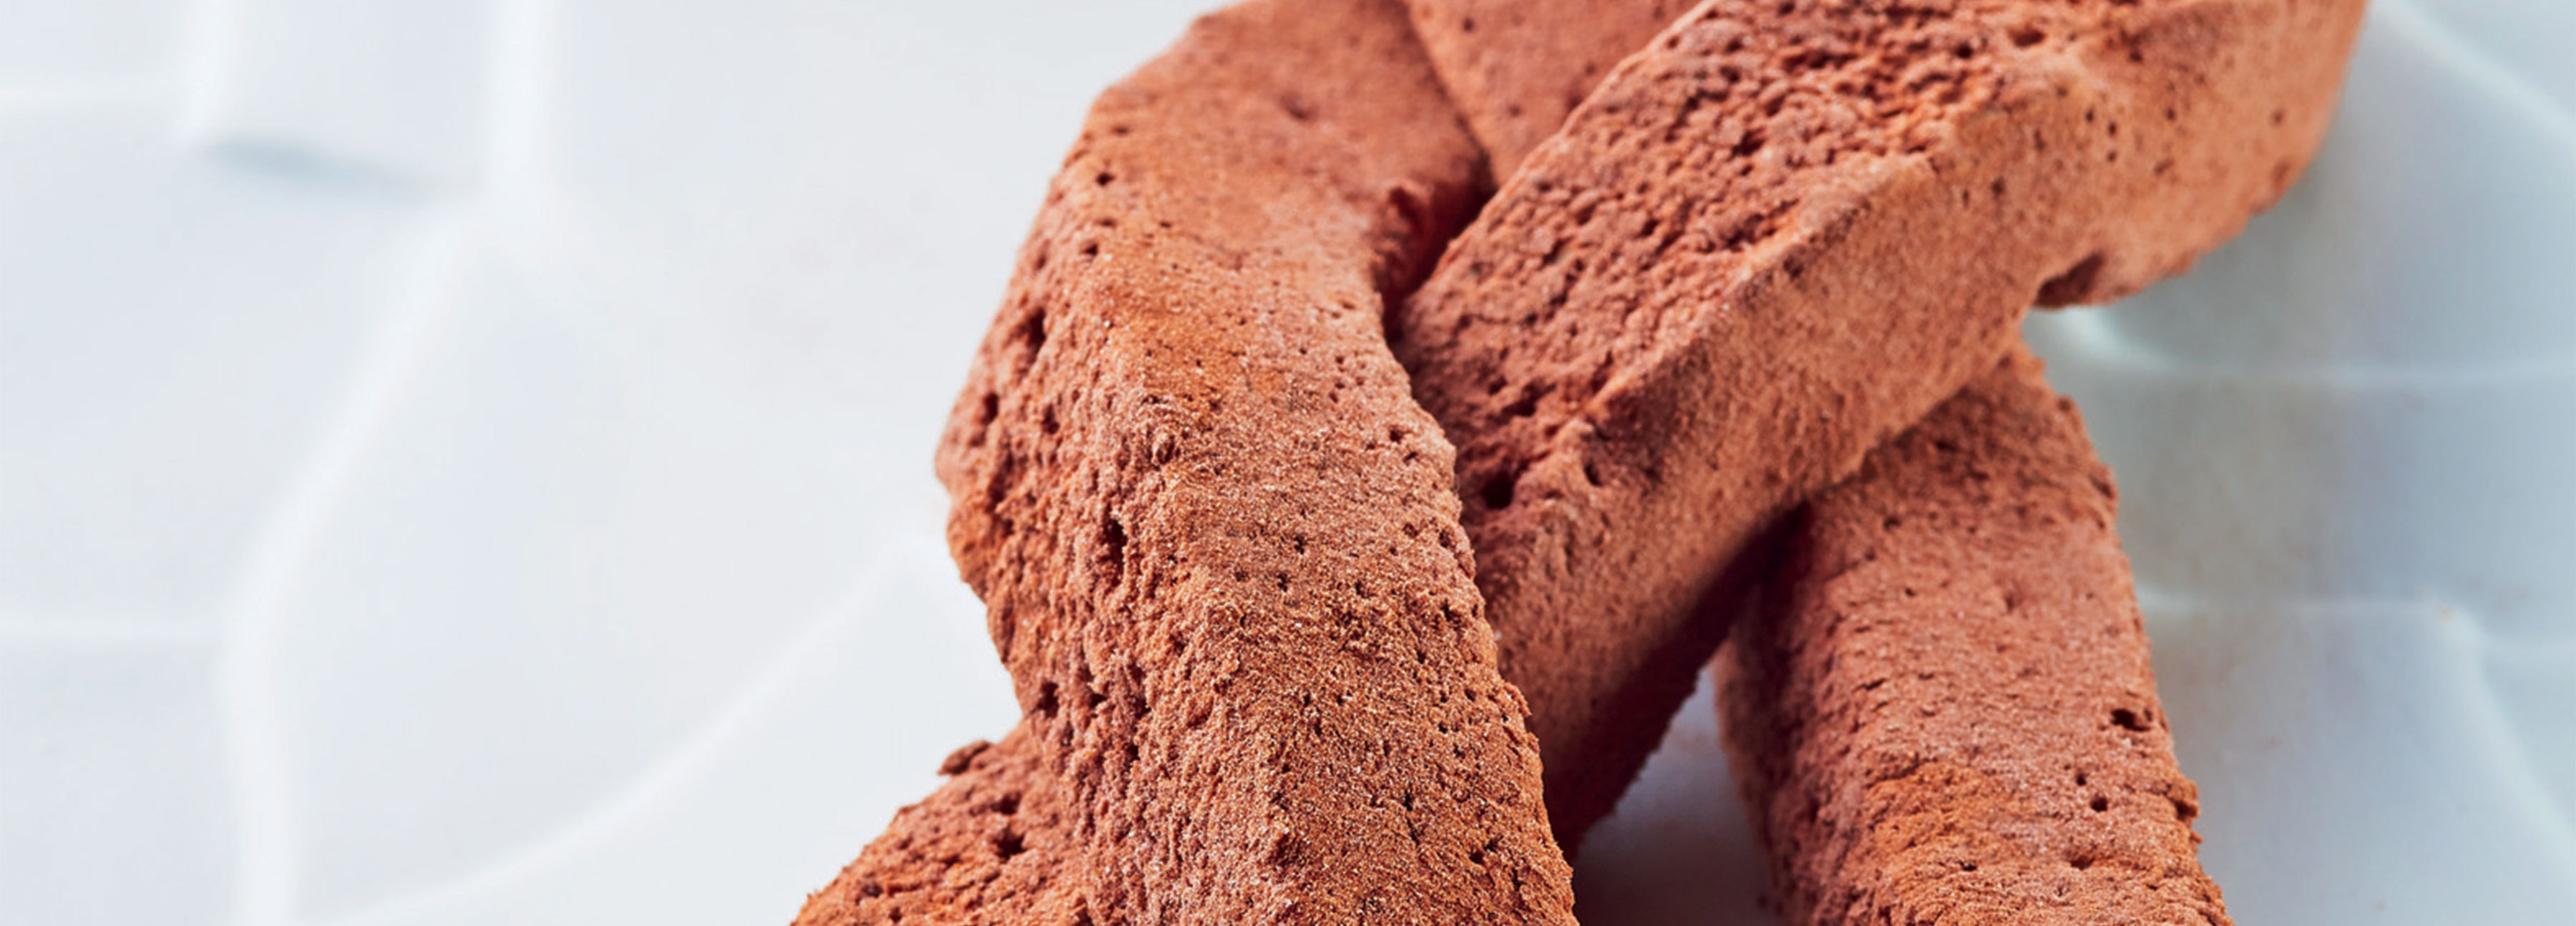 Chocolate marshmallow